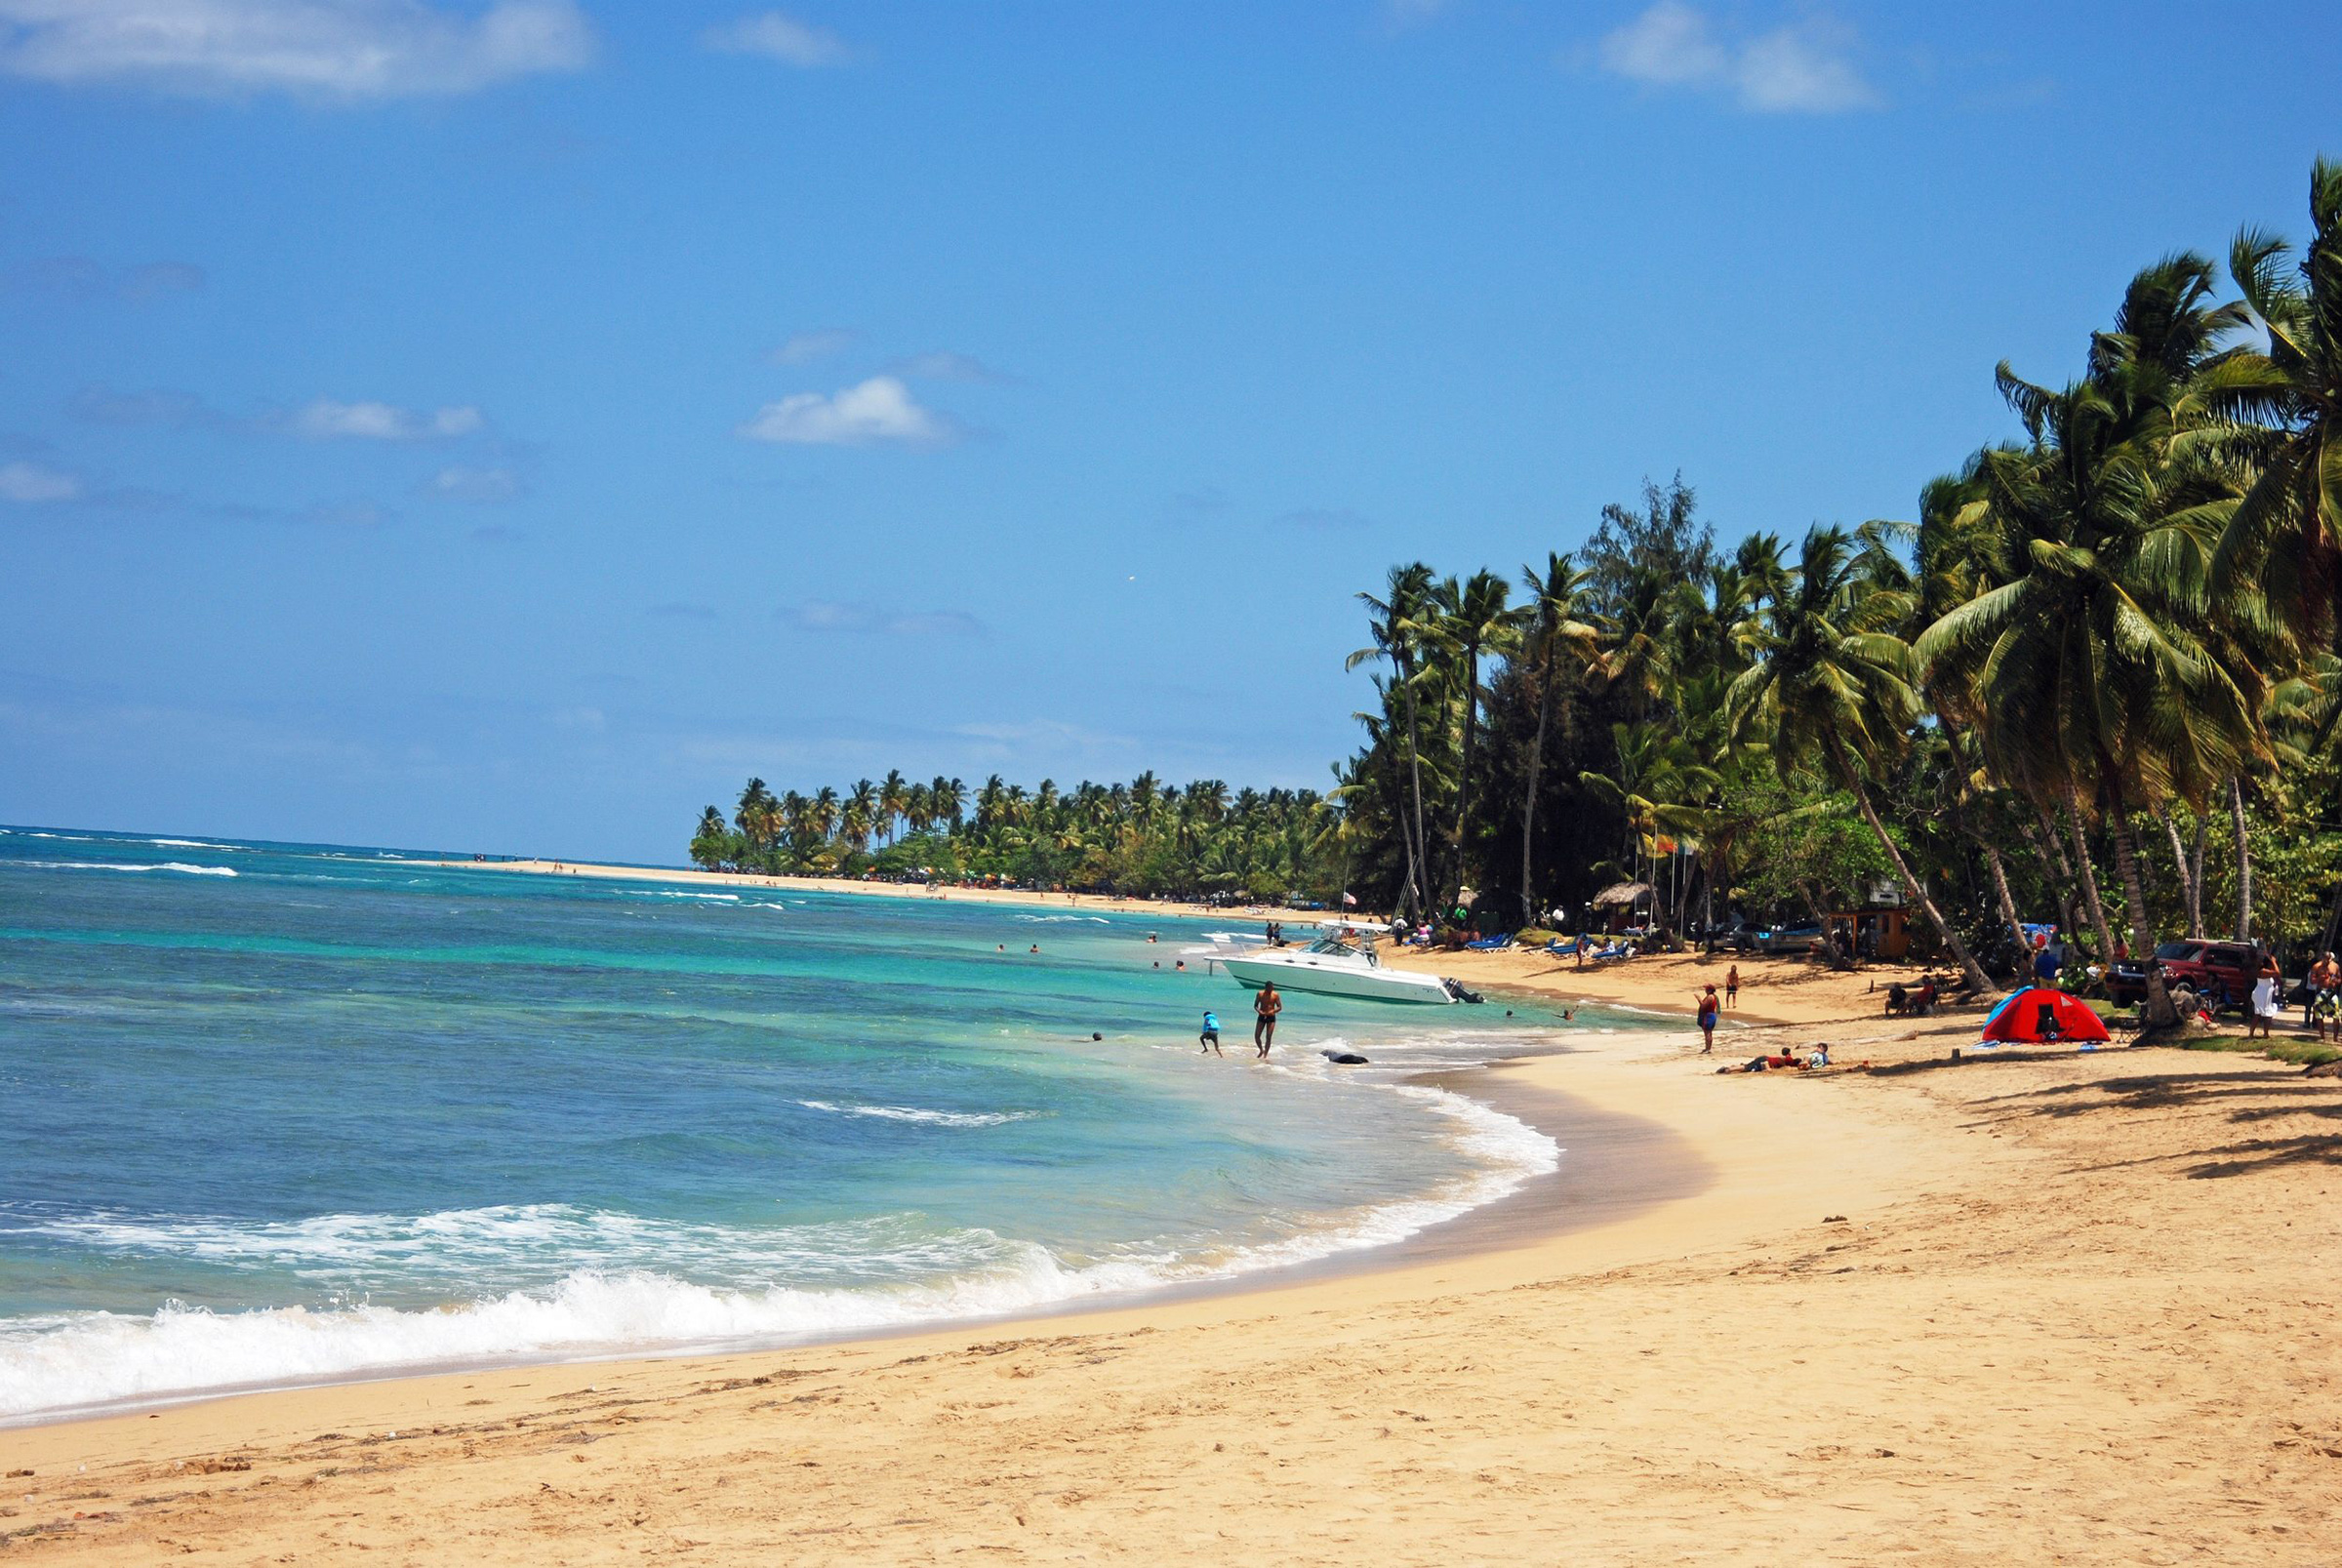 Ubicación: <span>Playa Punta Popy</span>